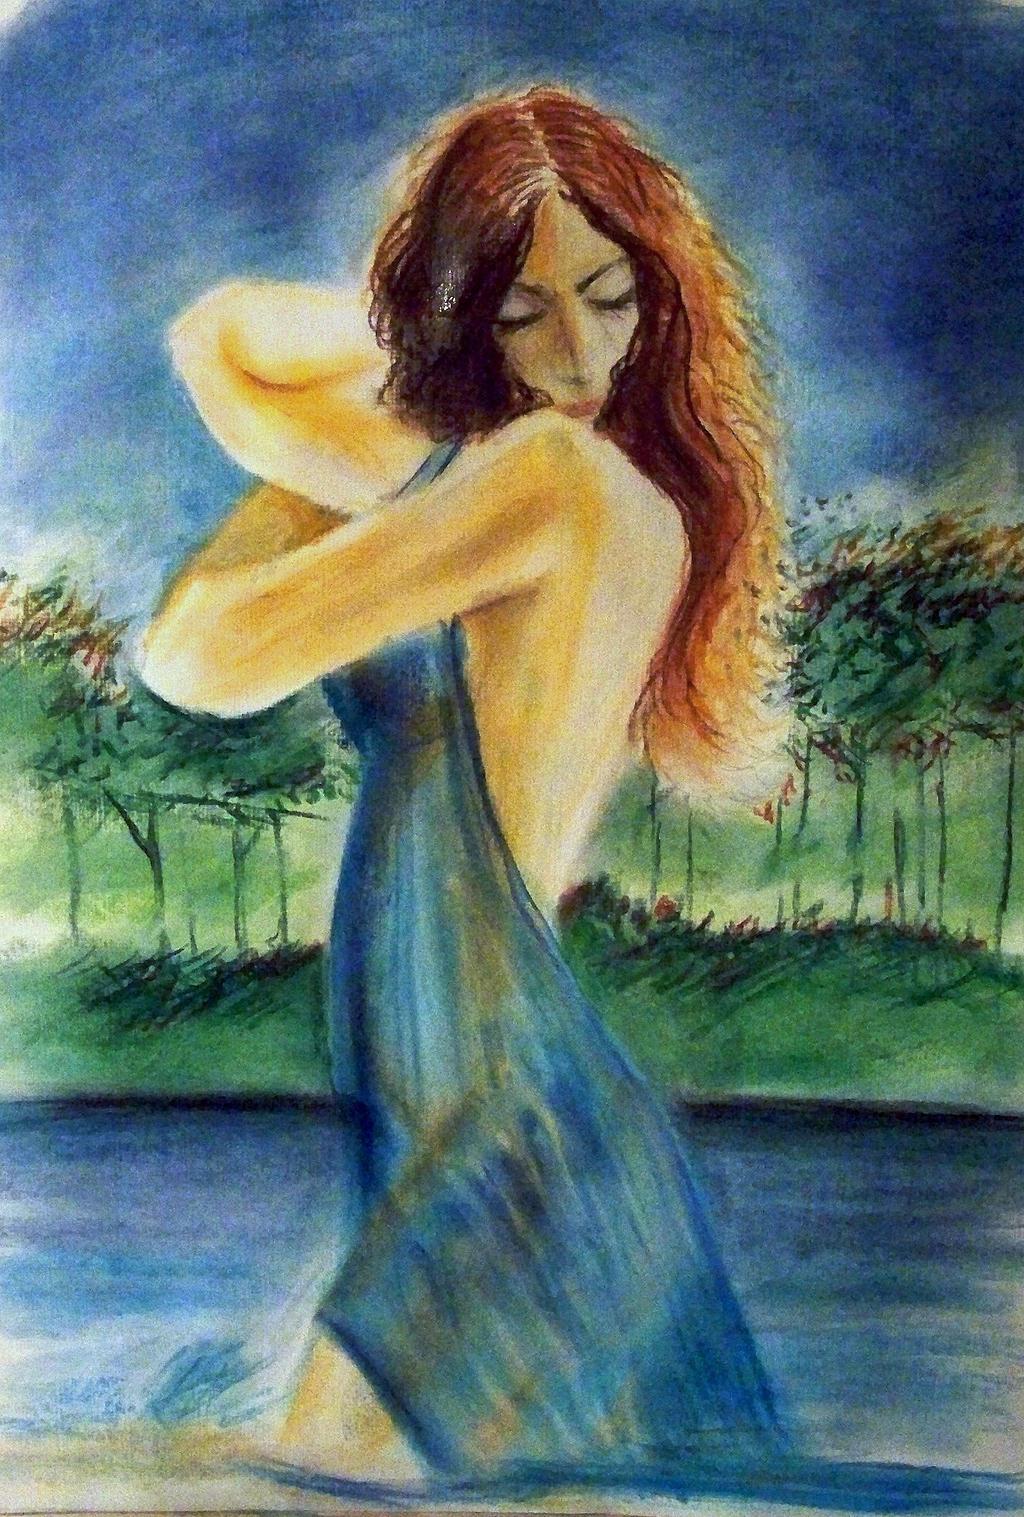 Aphrodite's Garden by philippeL